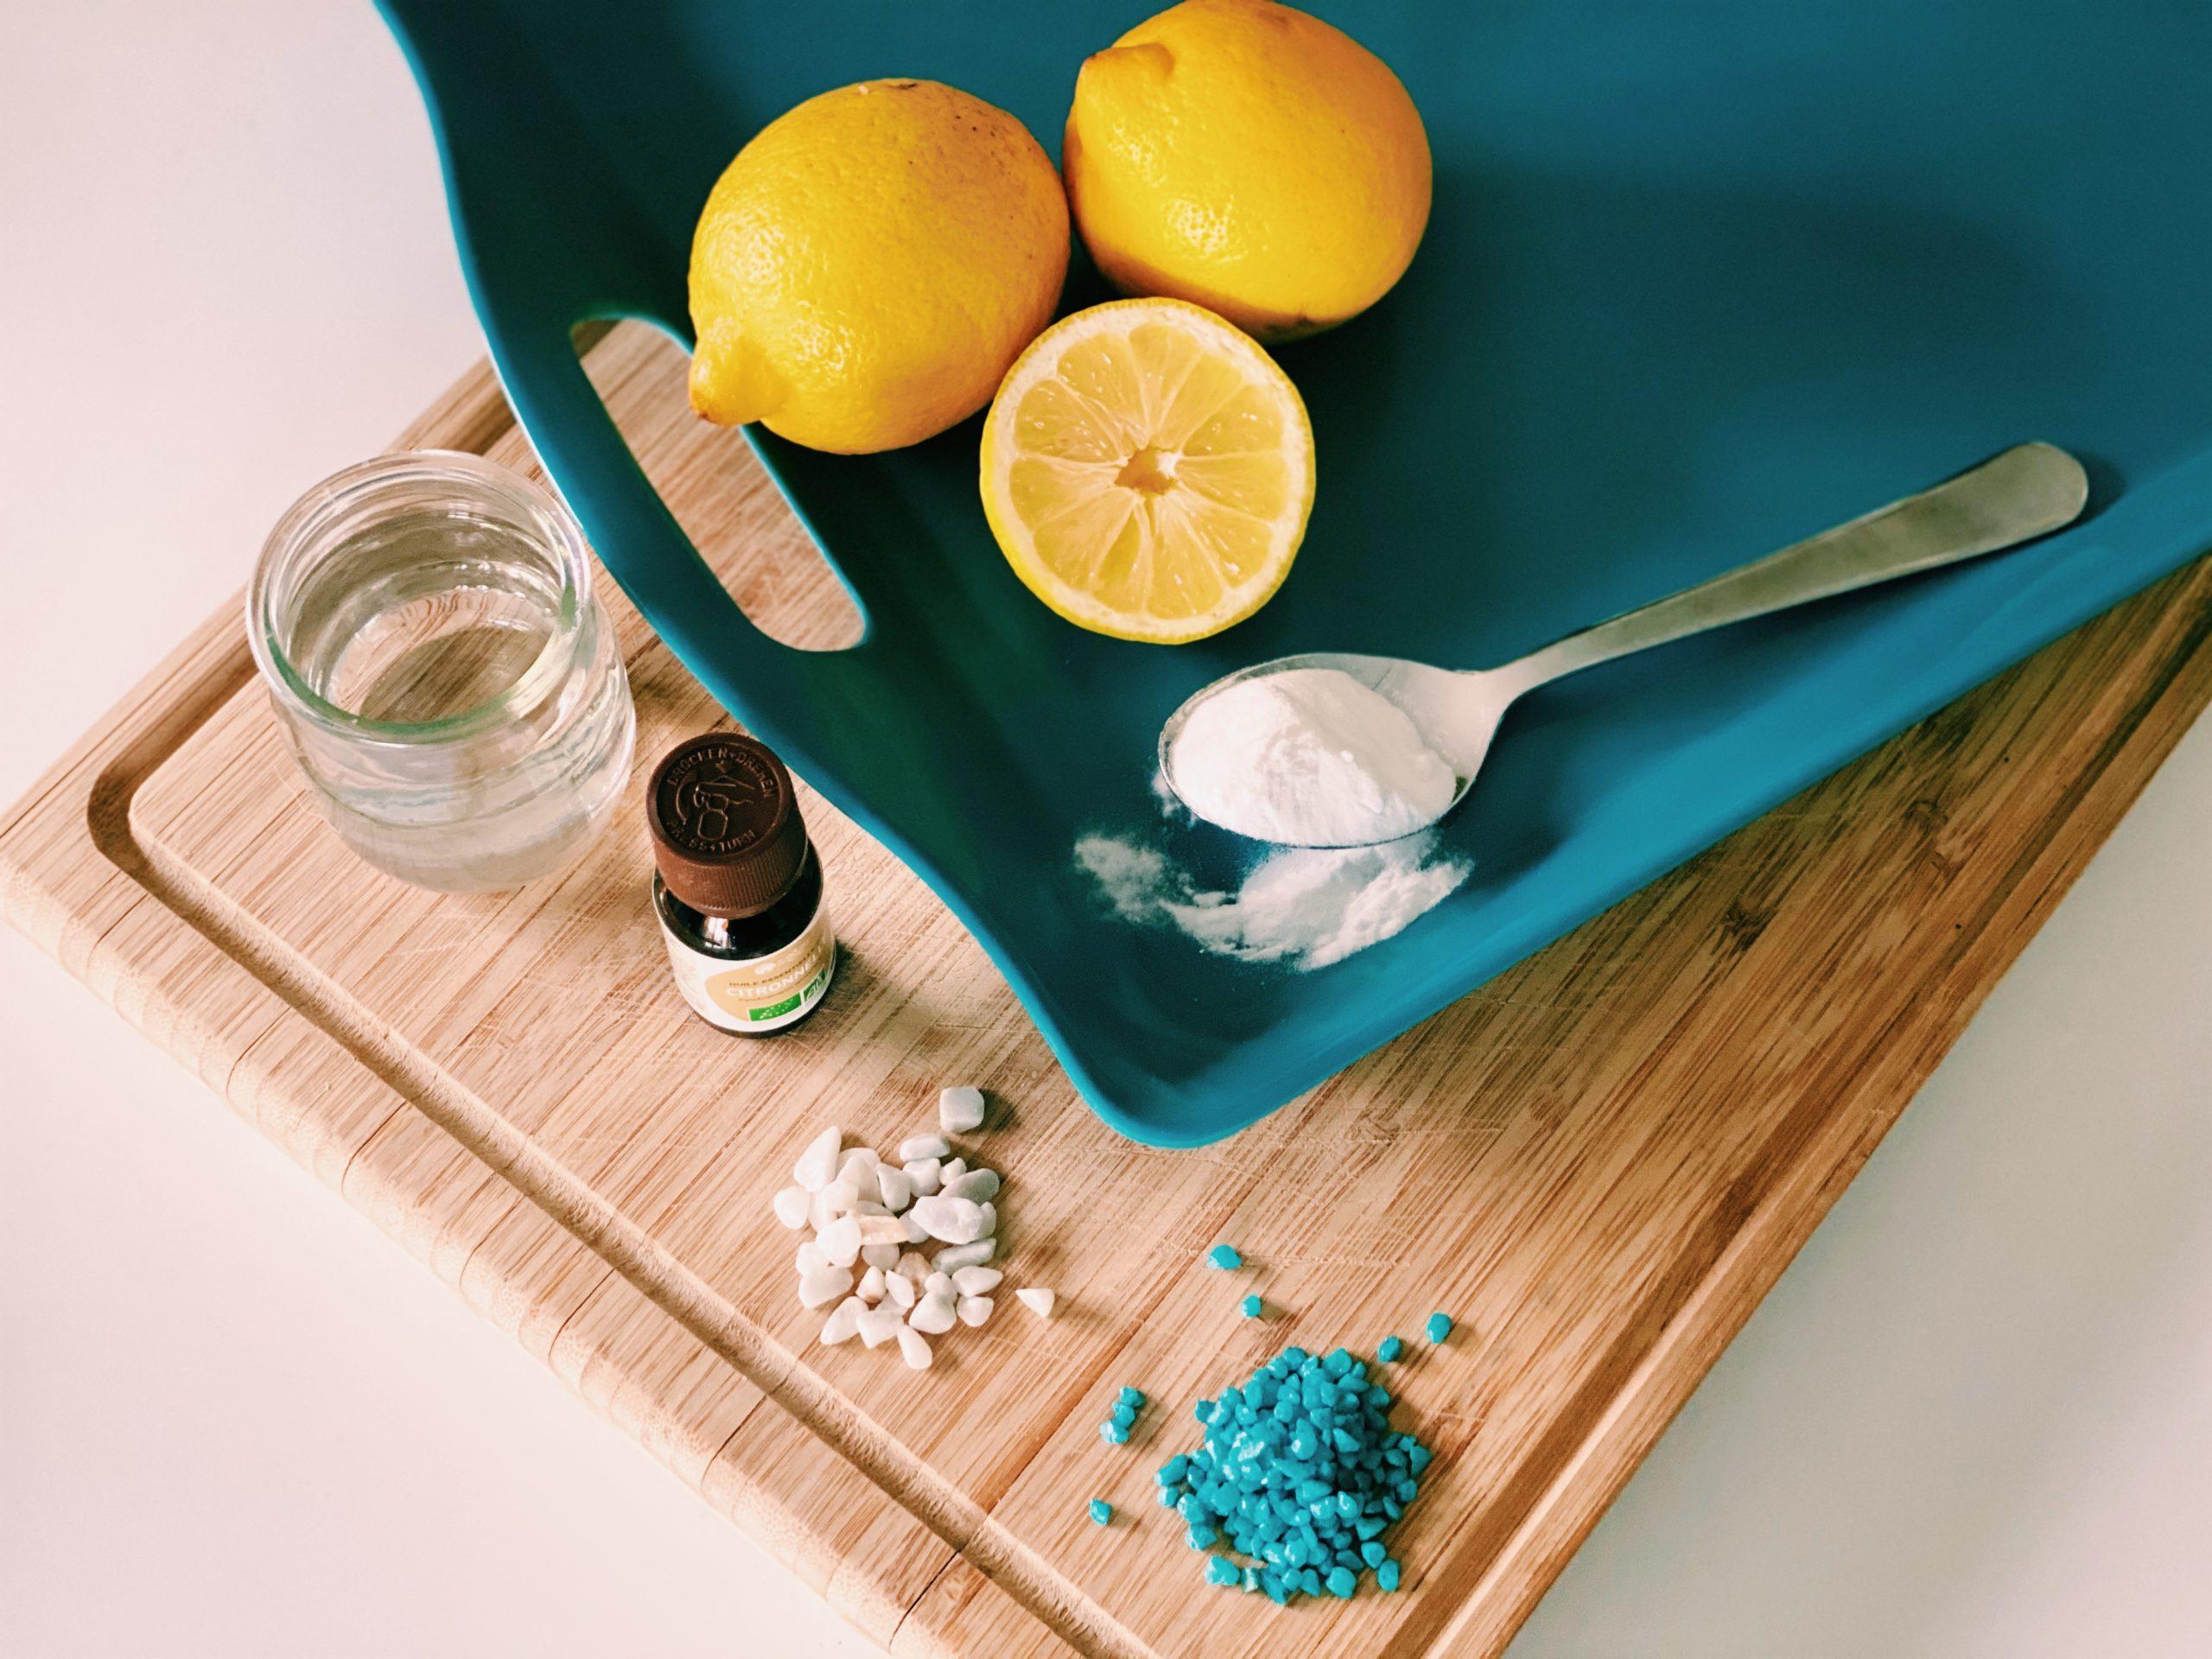 DIY : La recette de mon spray nettoyant multi-usage naturel